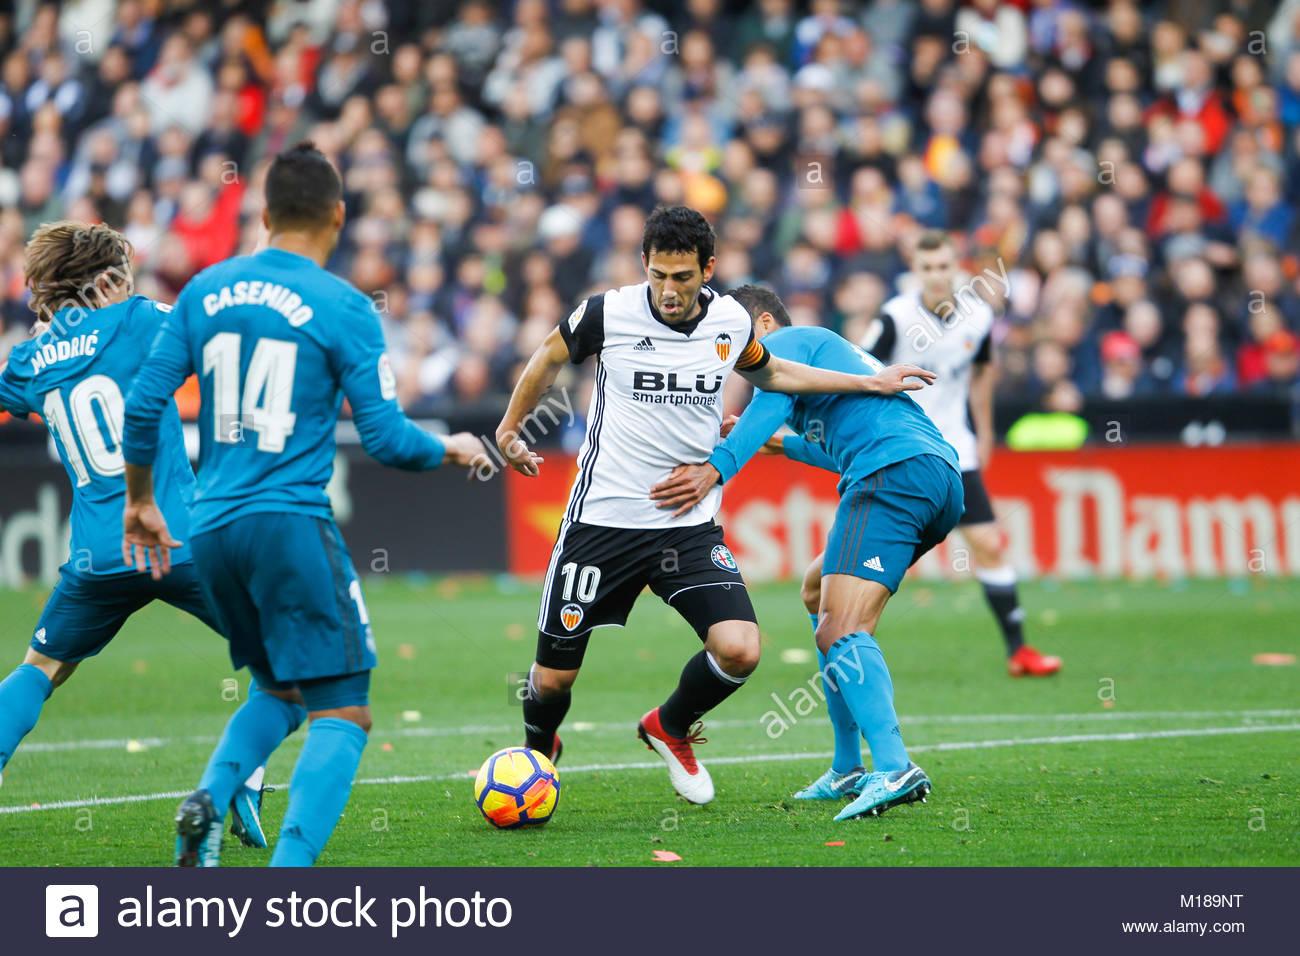 Valencia's Dani Parejo  during the La Liga Santander match between Valencia v Real Madrid at the Mestalla Stadium - Stock Image